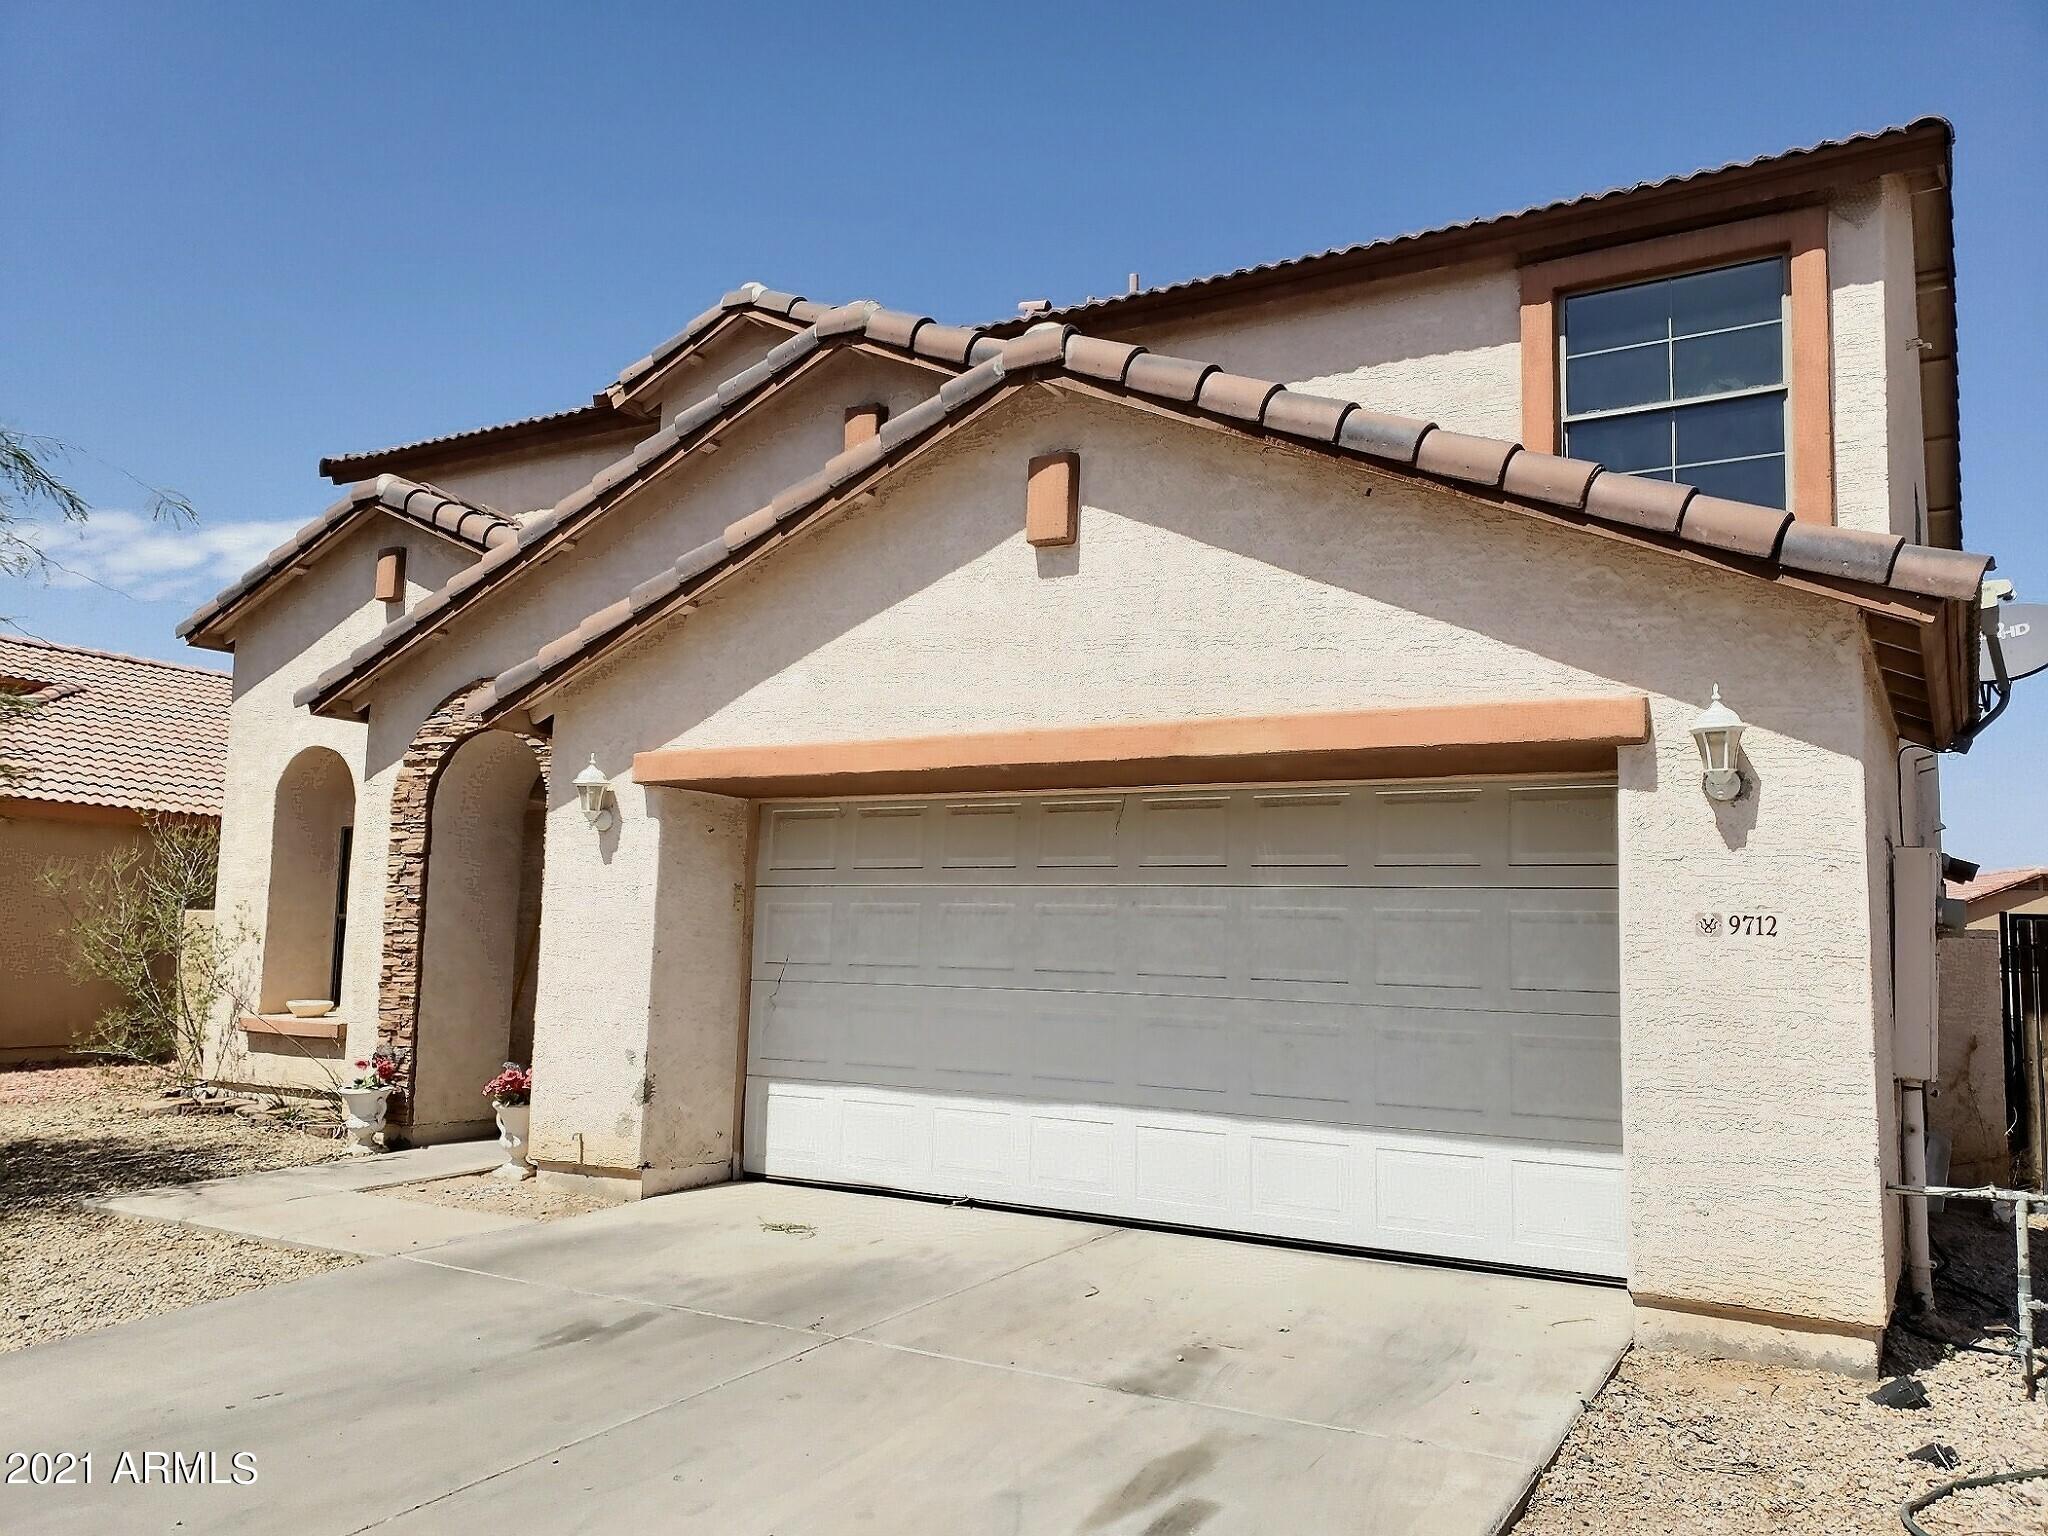 9712 RIVERSIDE Avenue, Tolleson, Arizona 85353, 5 Bedrooms Bedrooms, ,3 BathroomsBathrooms,Residential,For Sale,RIVERSIDE,6215411